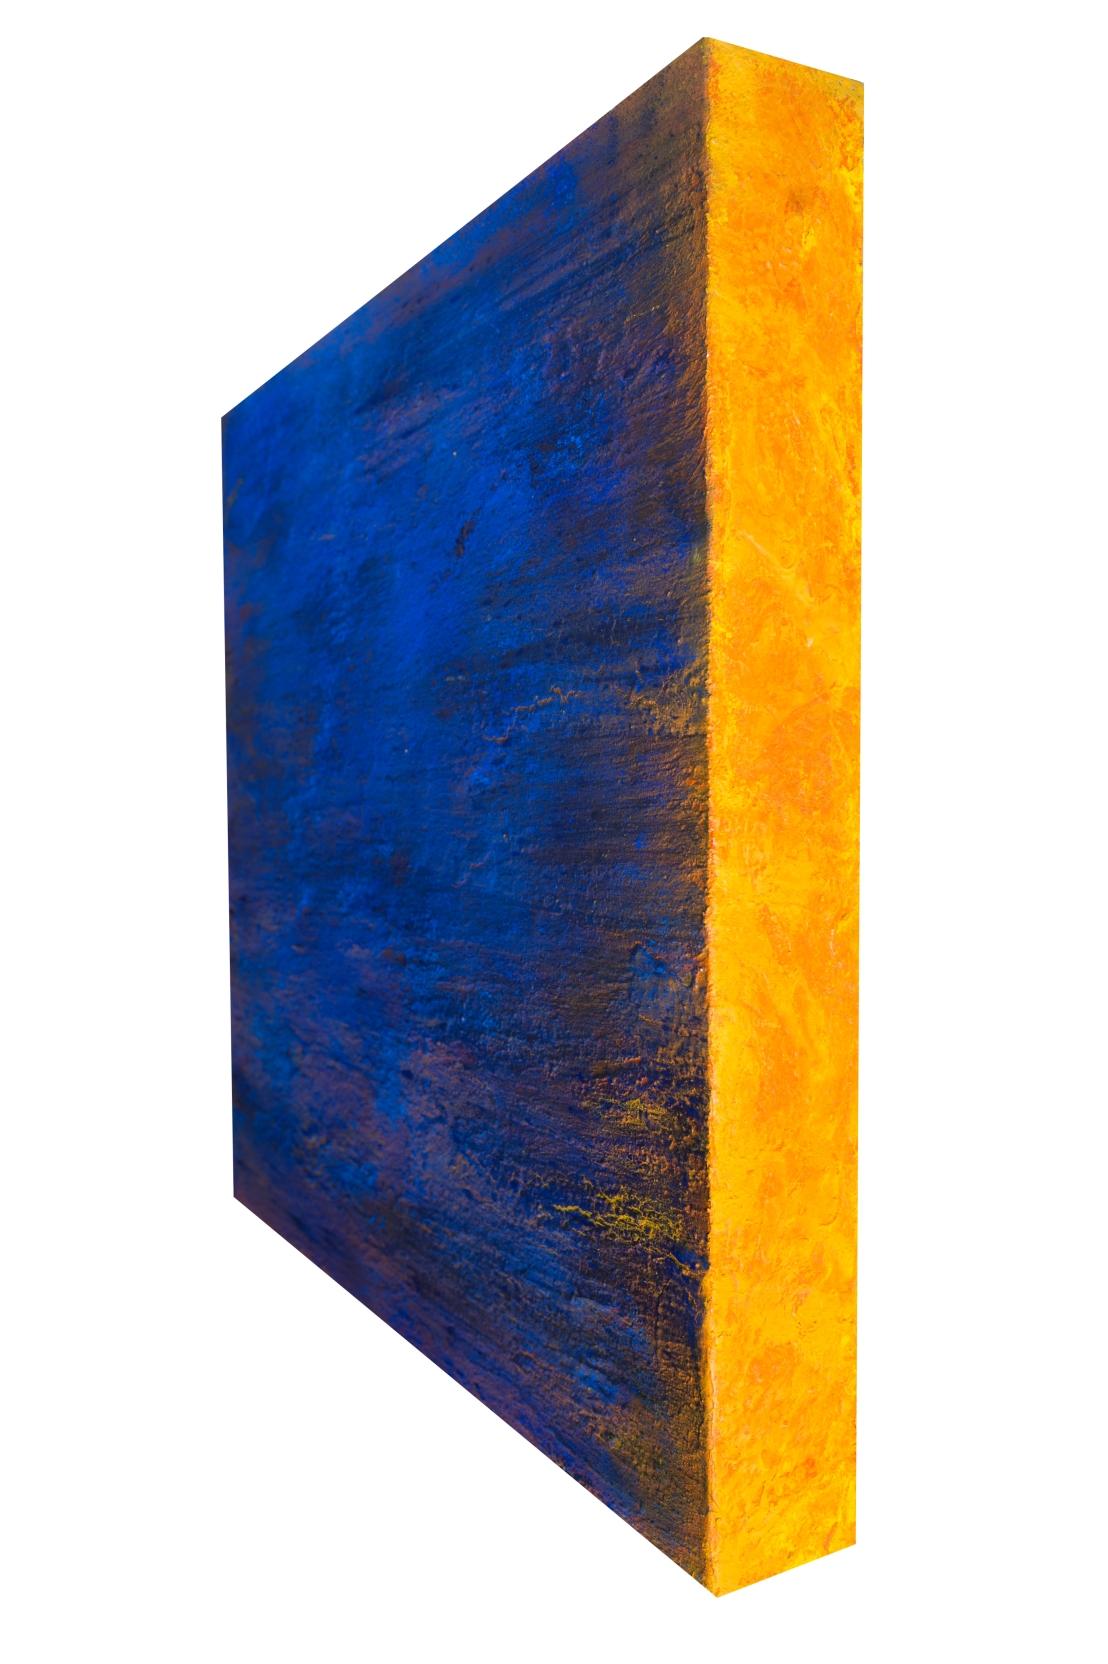 Alberto Reguera 2017 100 x 100x 13 cm pg (2)